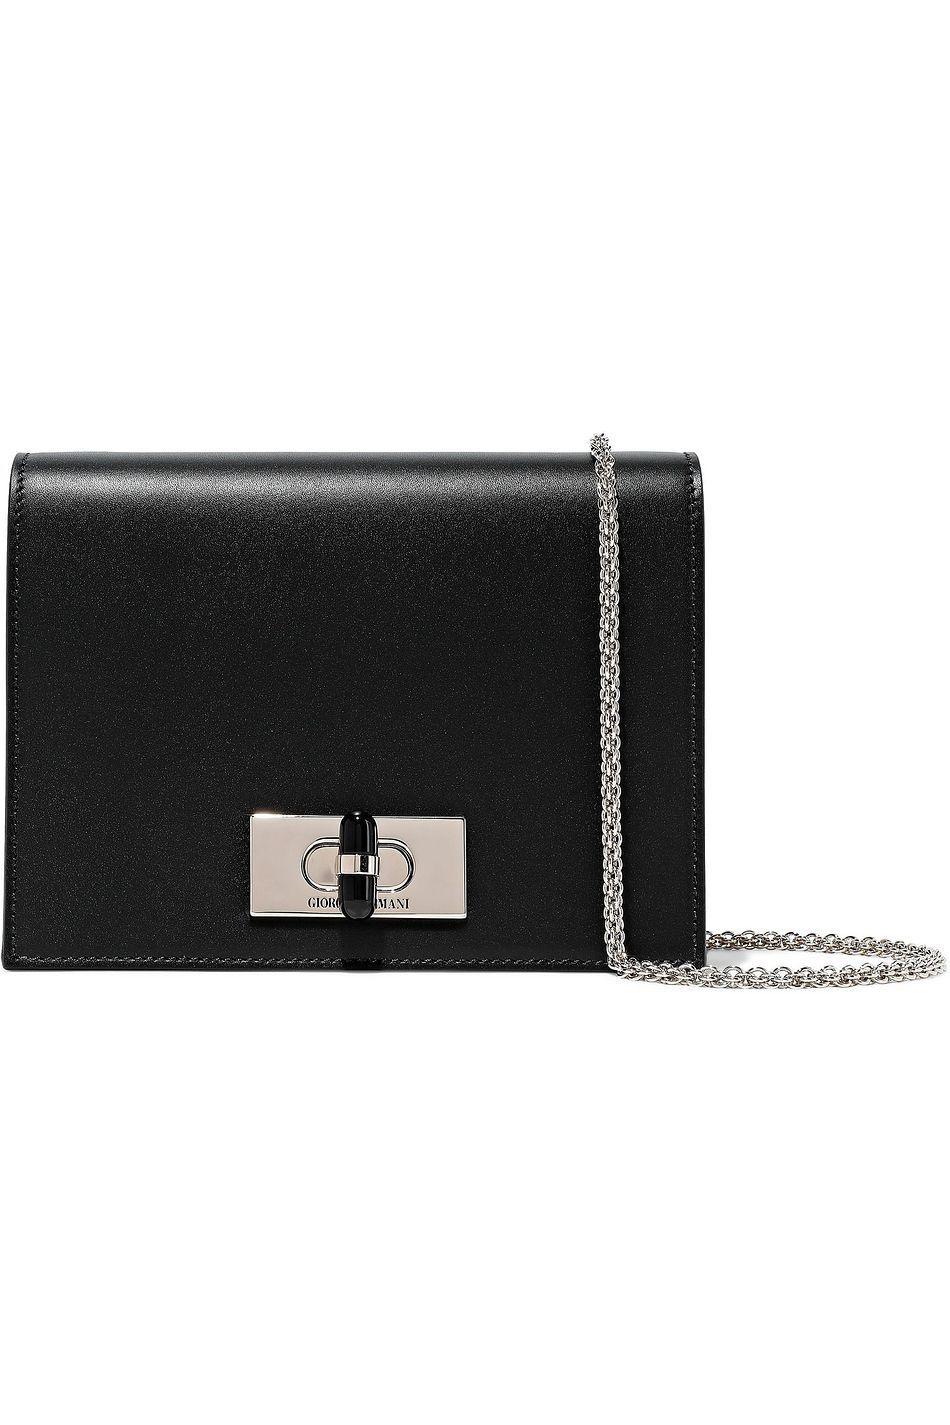 Black Calliope mini leather shoulder bag | Sale up to 70% off | THE OUTNET | GIORGIO ARMANI | THE OUTNET